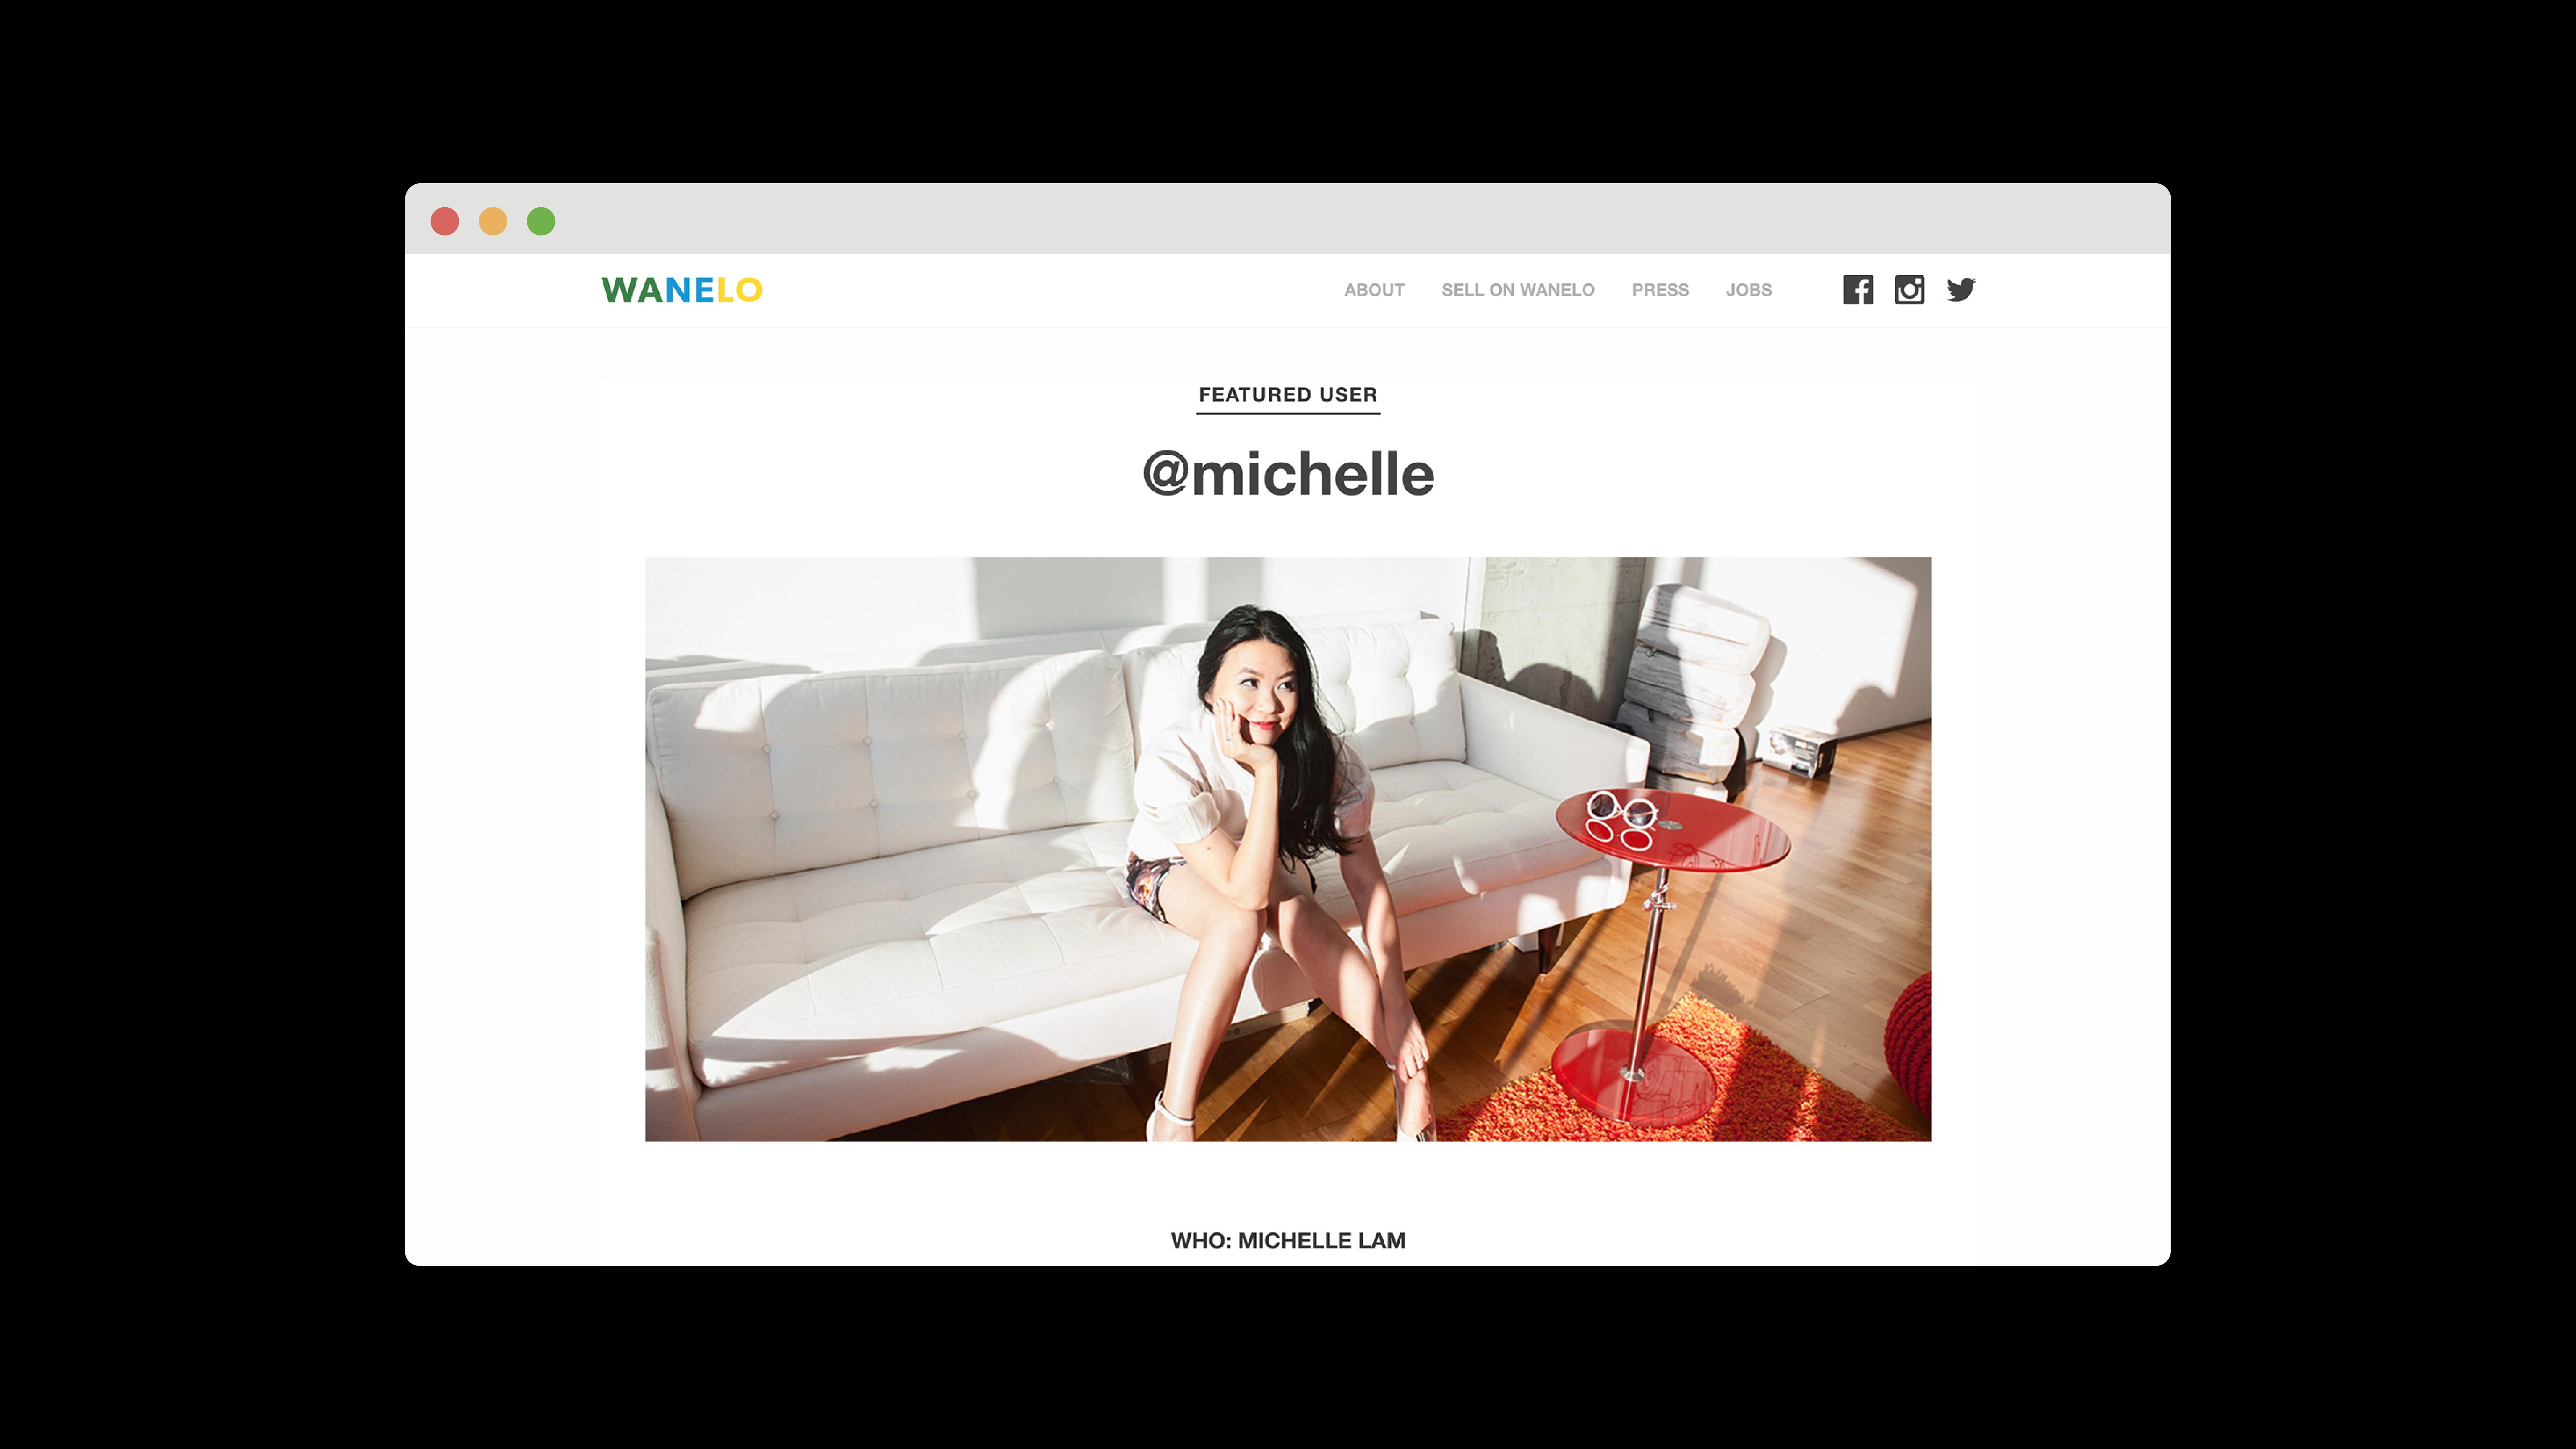 Wanelo Featured Users